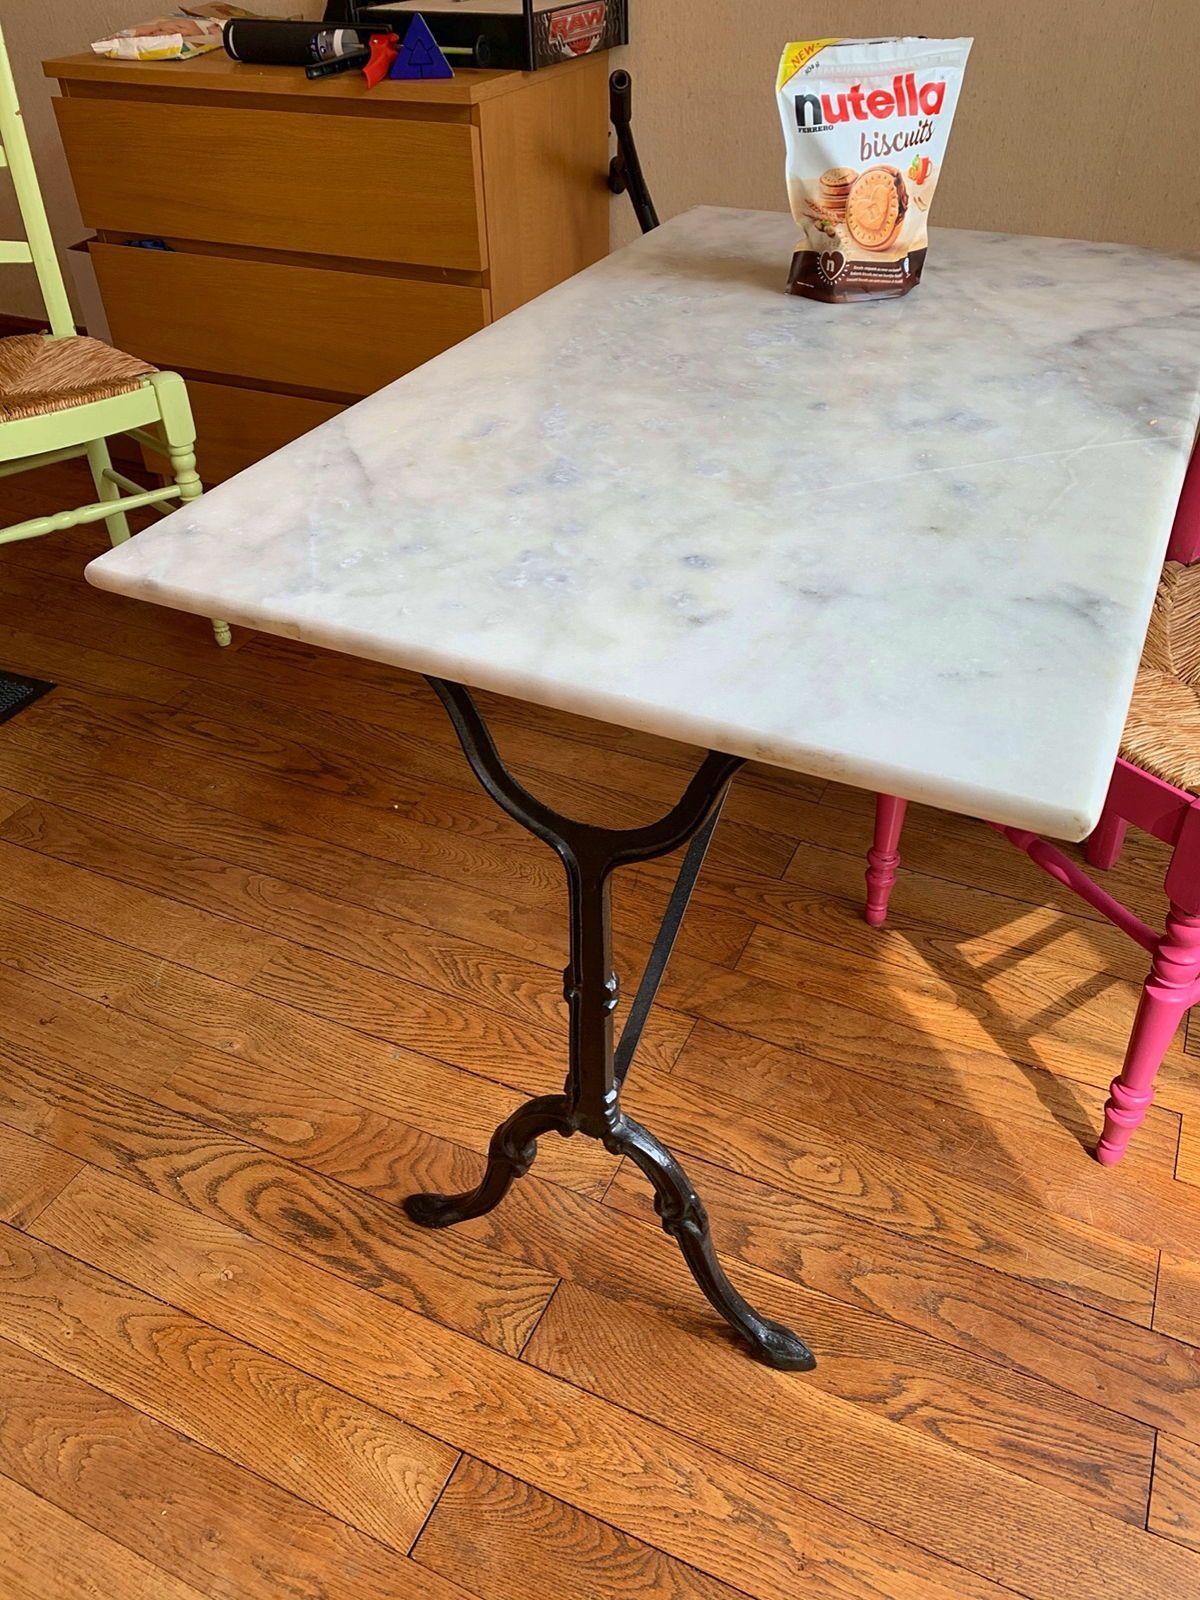 Vends table bistrot en marbre et fer forgé